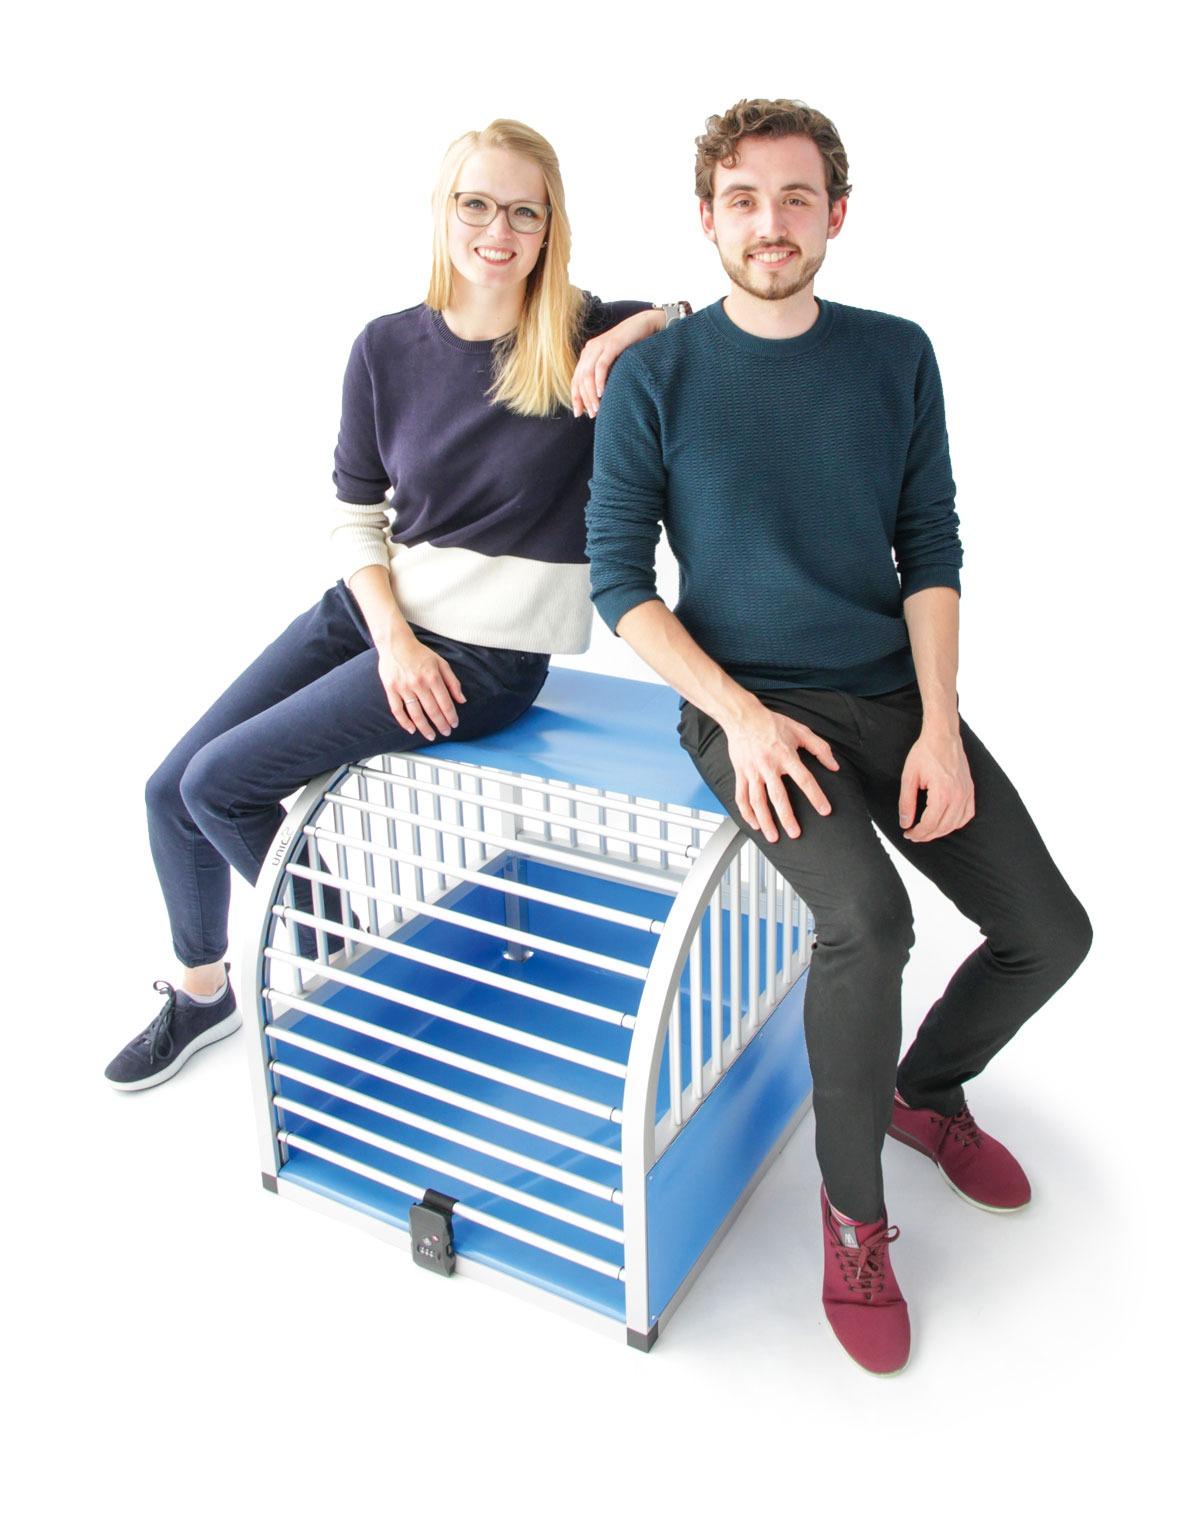 unic Kundenservice, Carina Frohberger und Daniel Otto